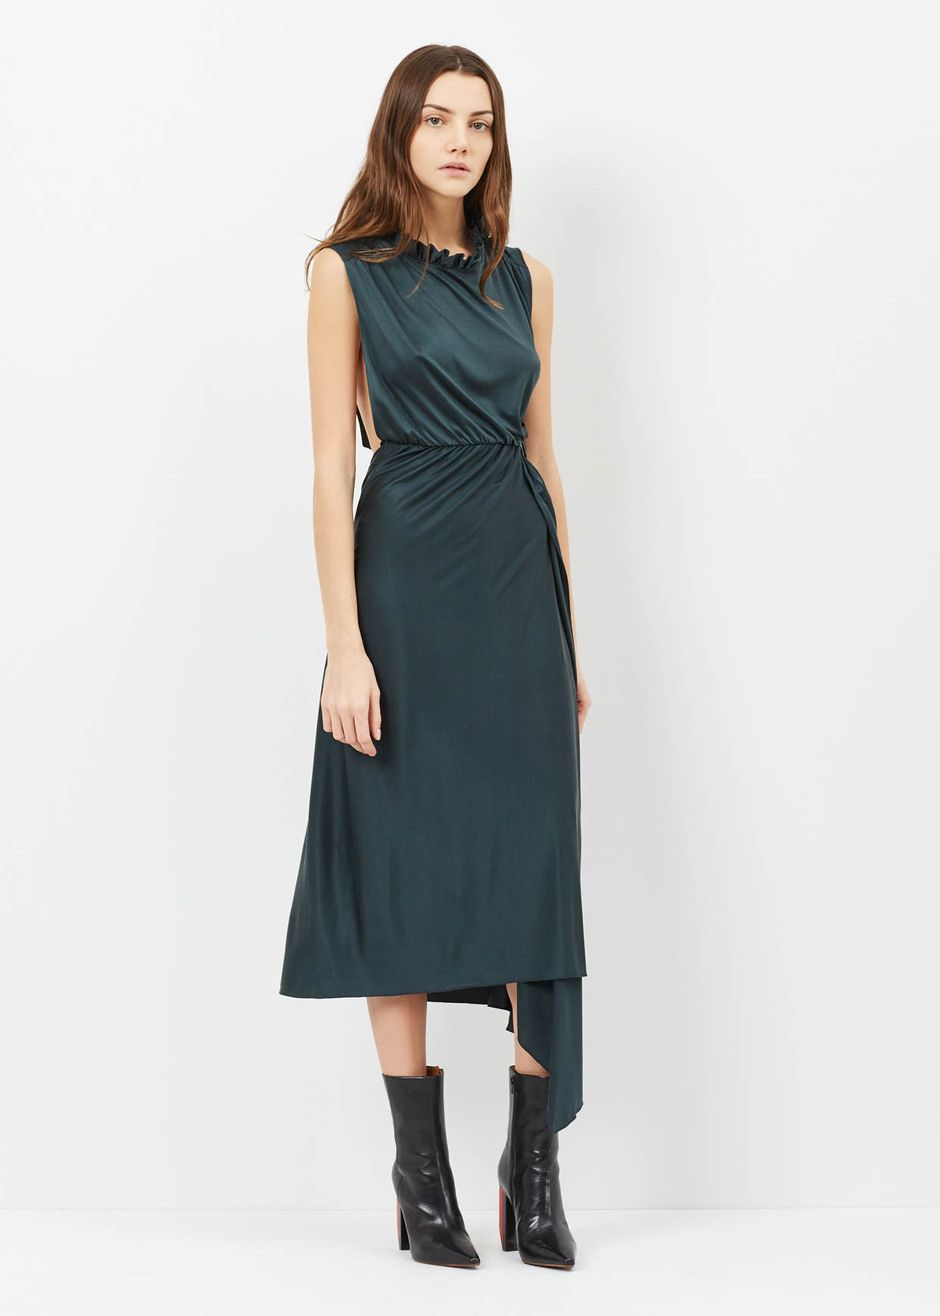 Vetements Wrap Around Dress (Green)